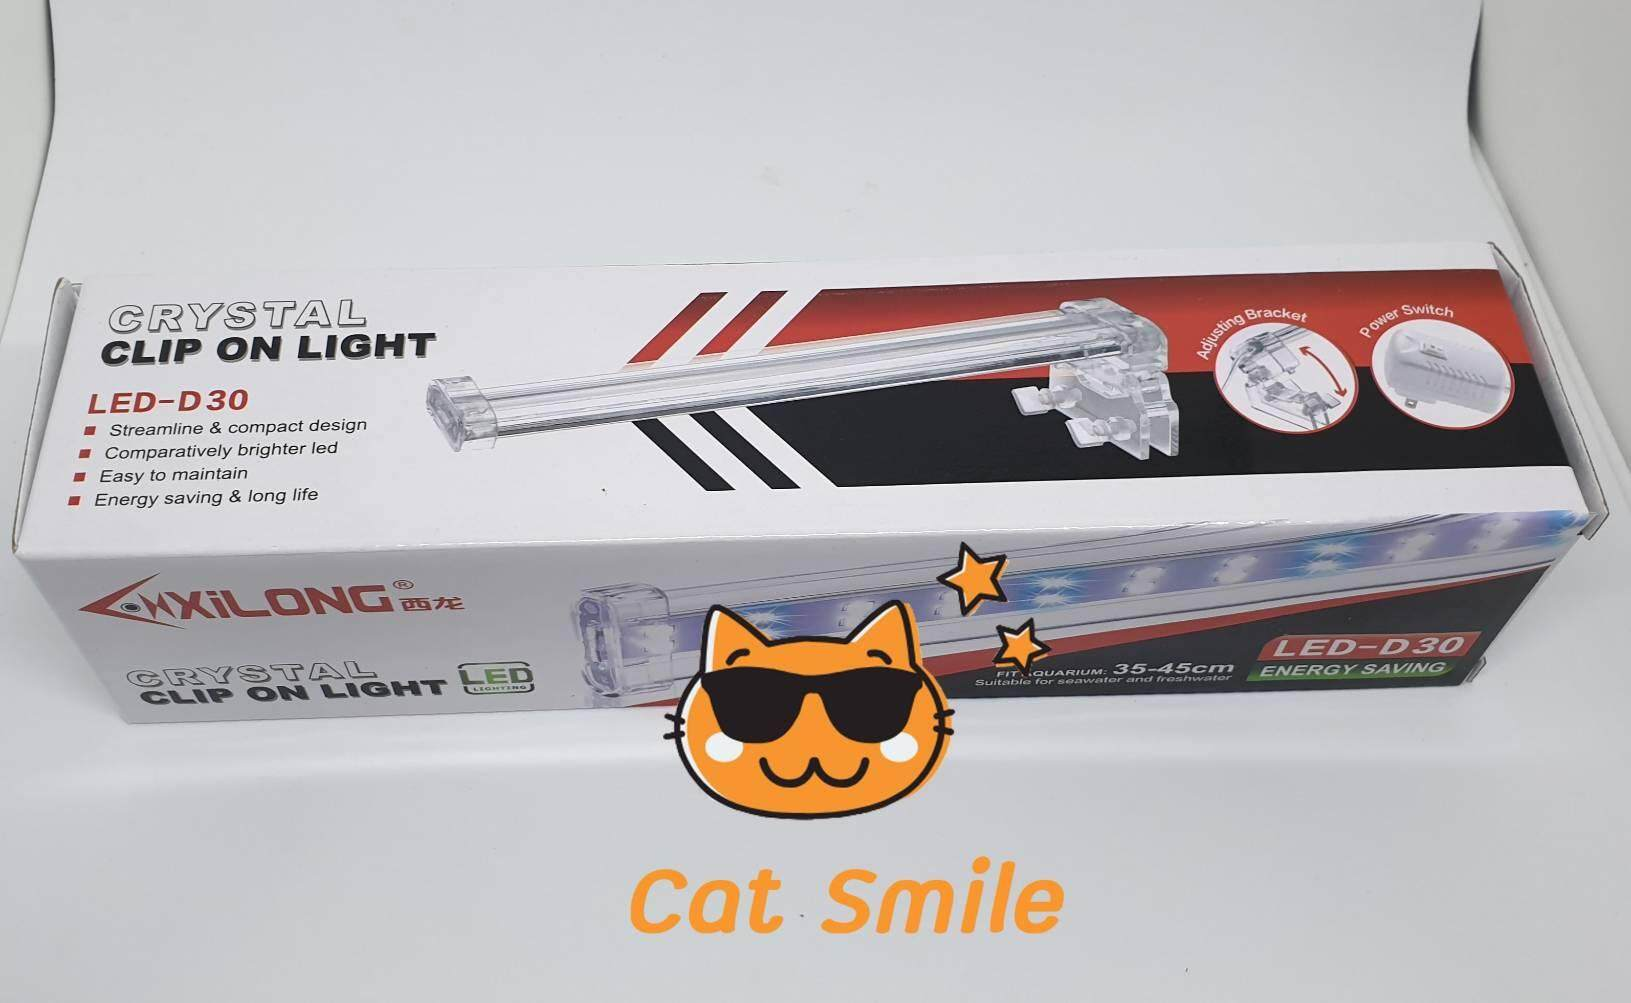 Xilong Crystal Clip on light LED-D30